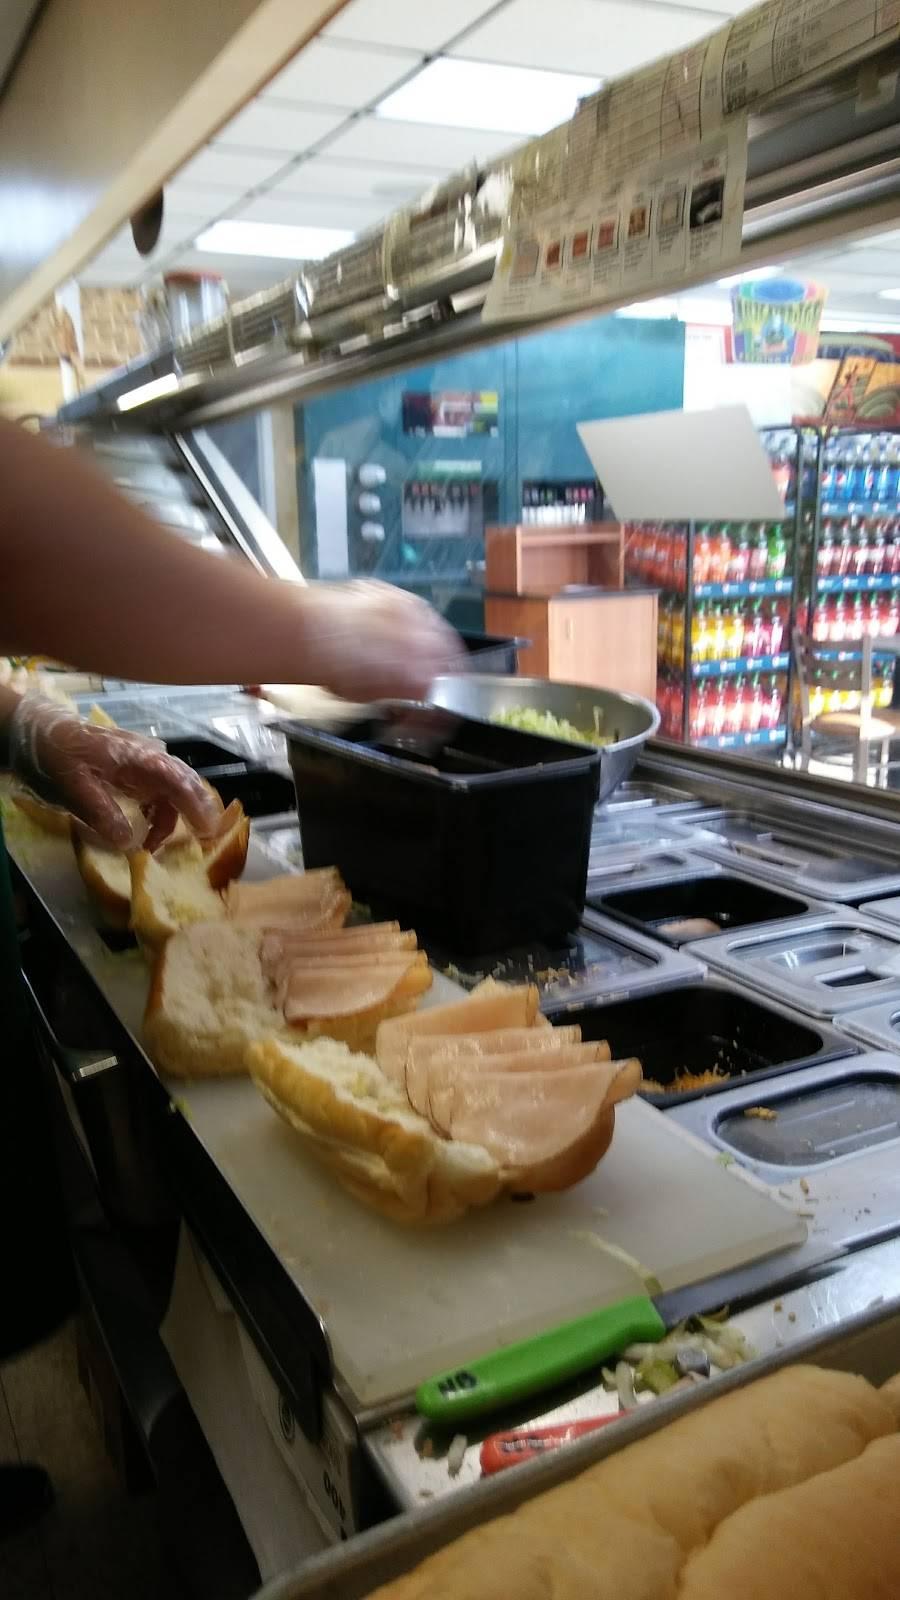 Subway - meal takeaway  | Photo 5 of 7 | Address: 4948 N Peoria Ave, Tulsa, OK 74126, USA | Phone: (918) 425-6209